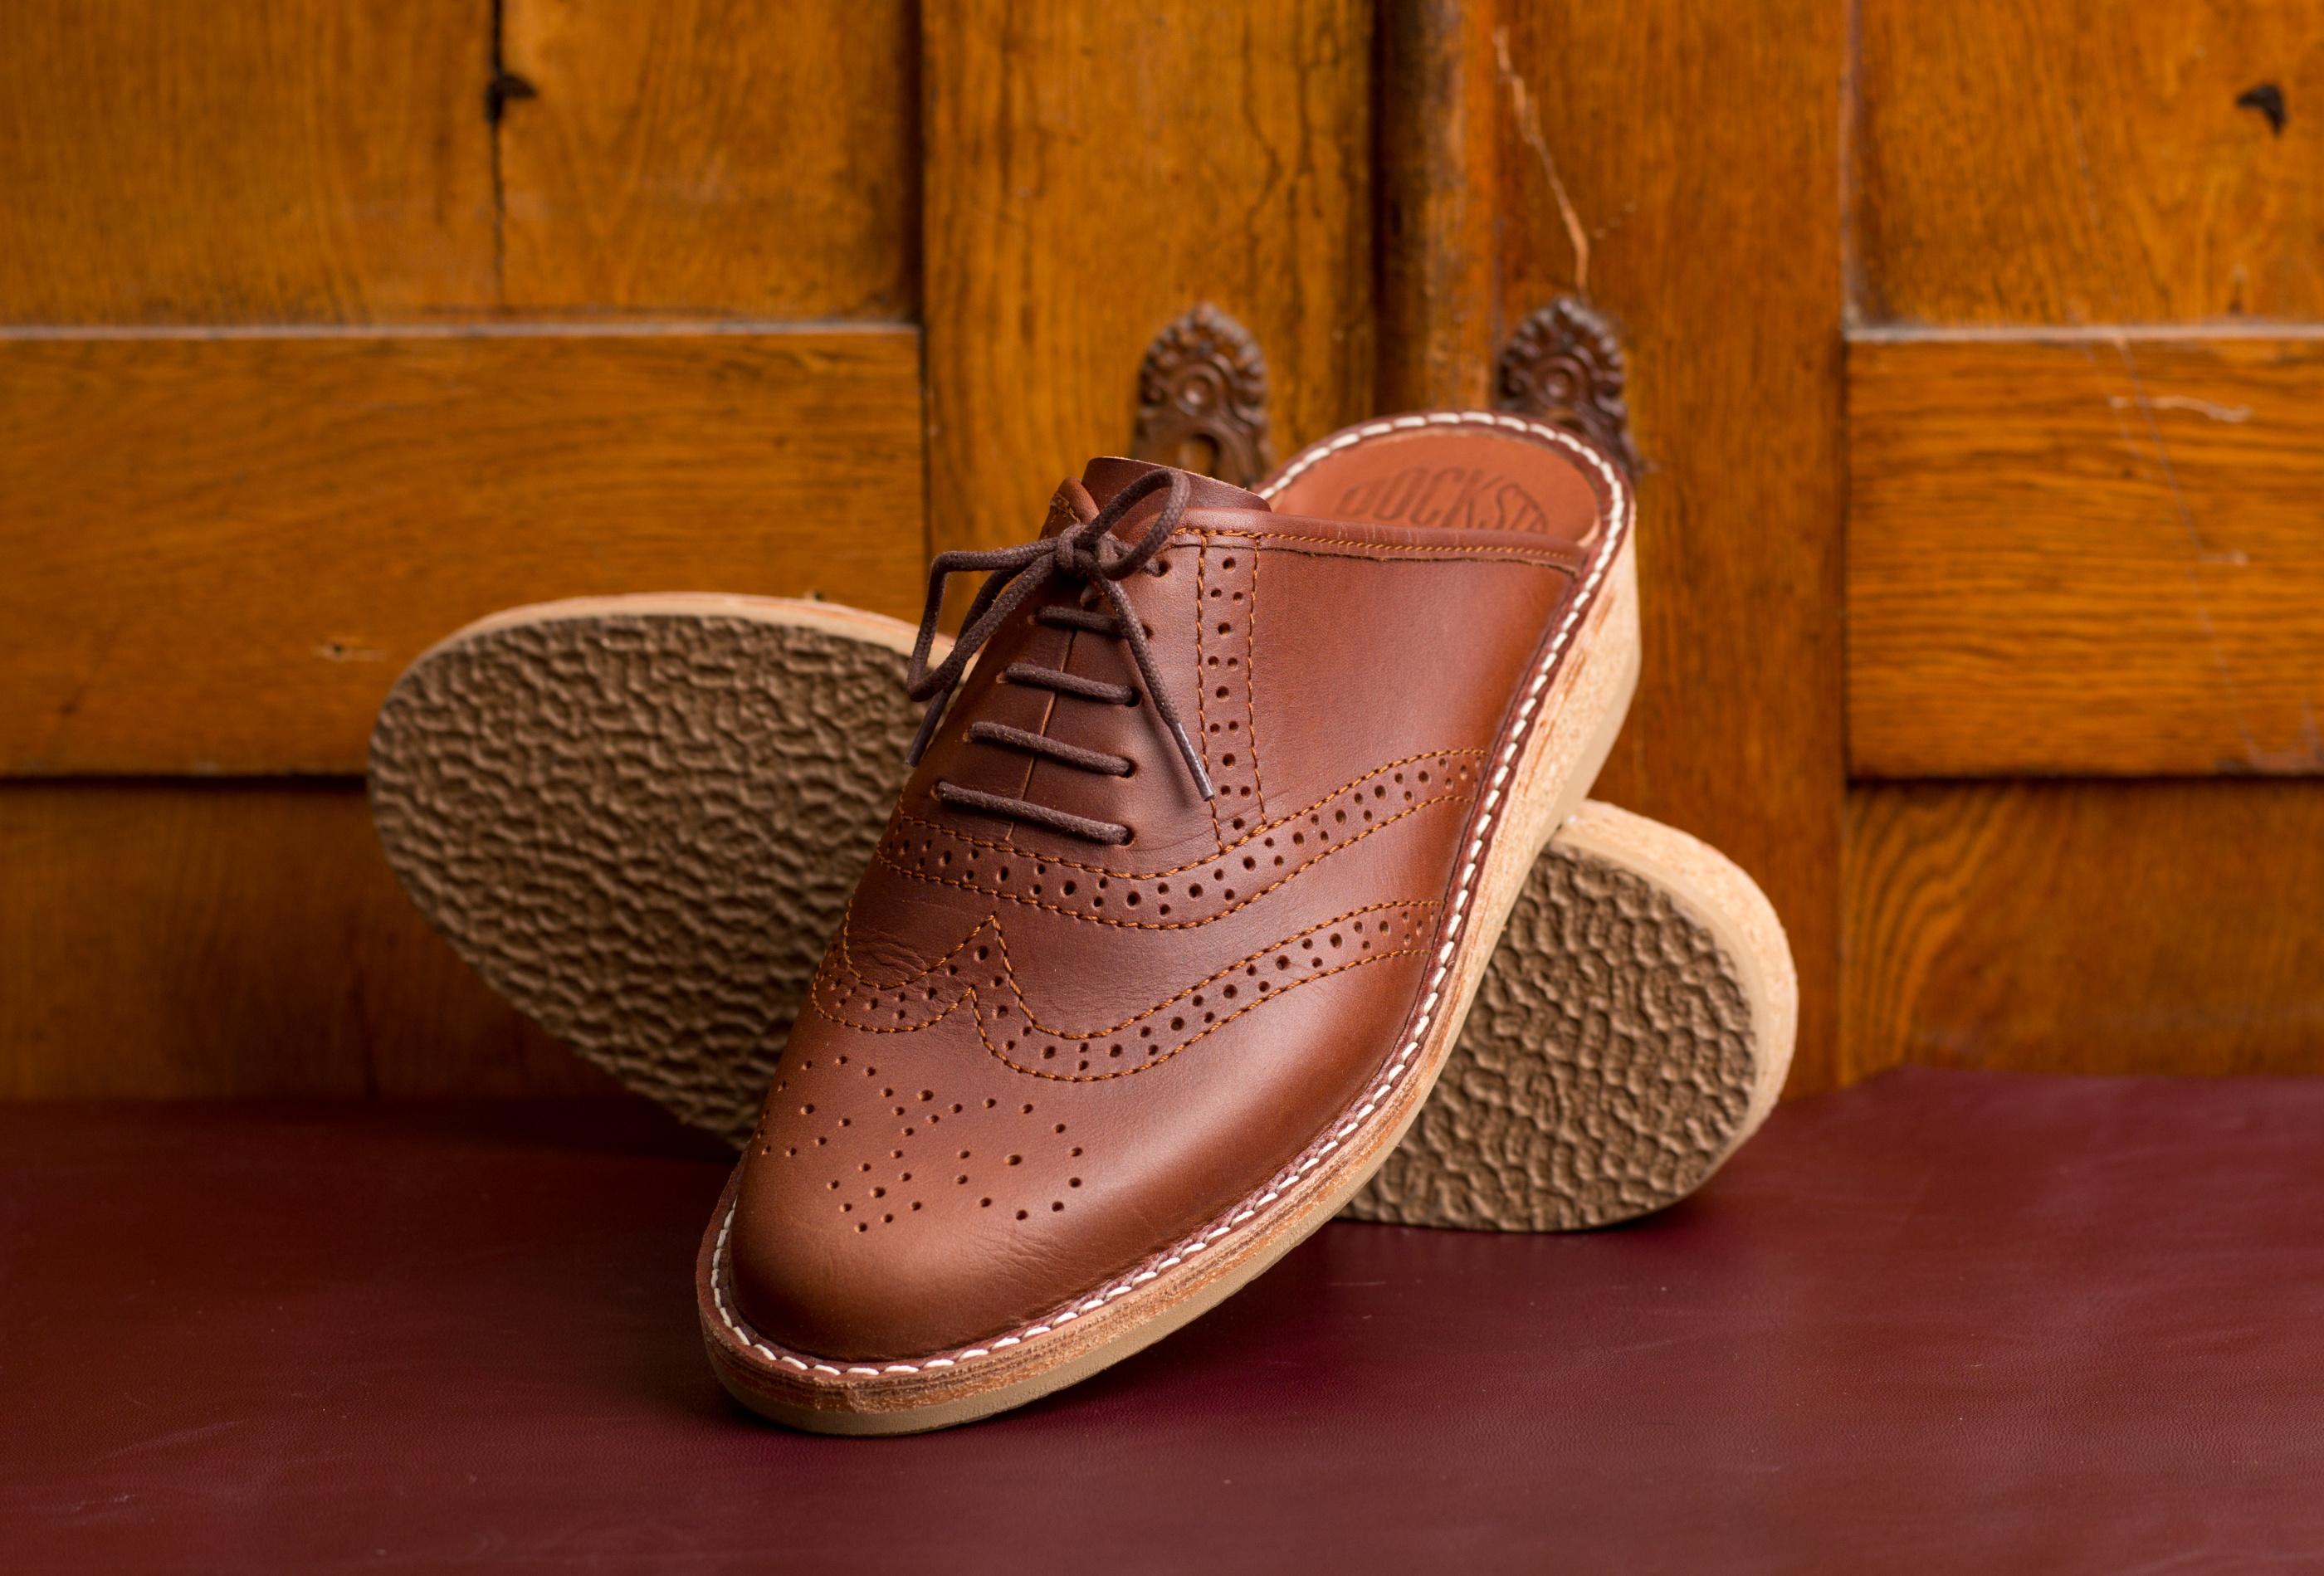 Docksta Slippers Brogues